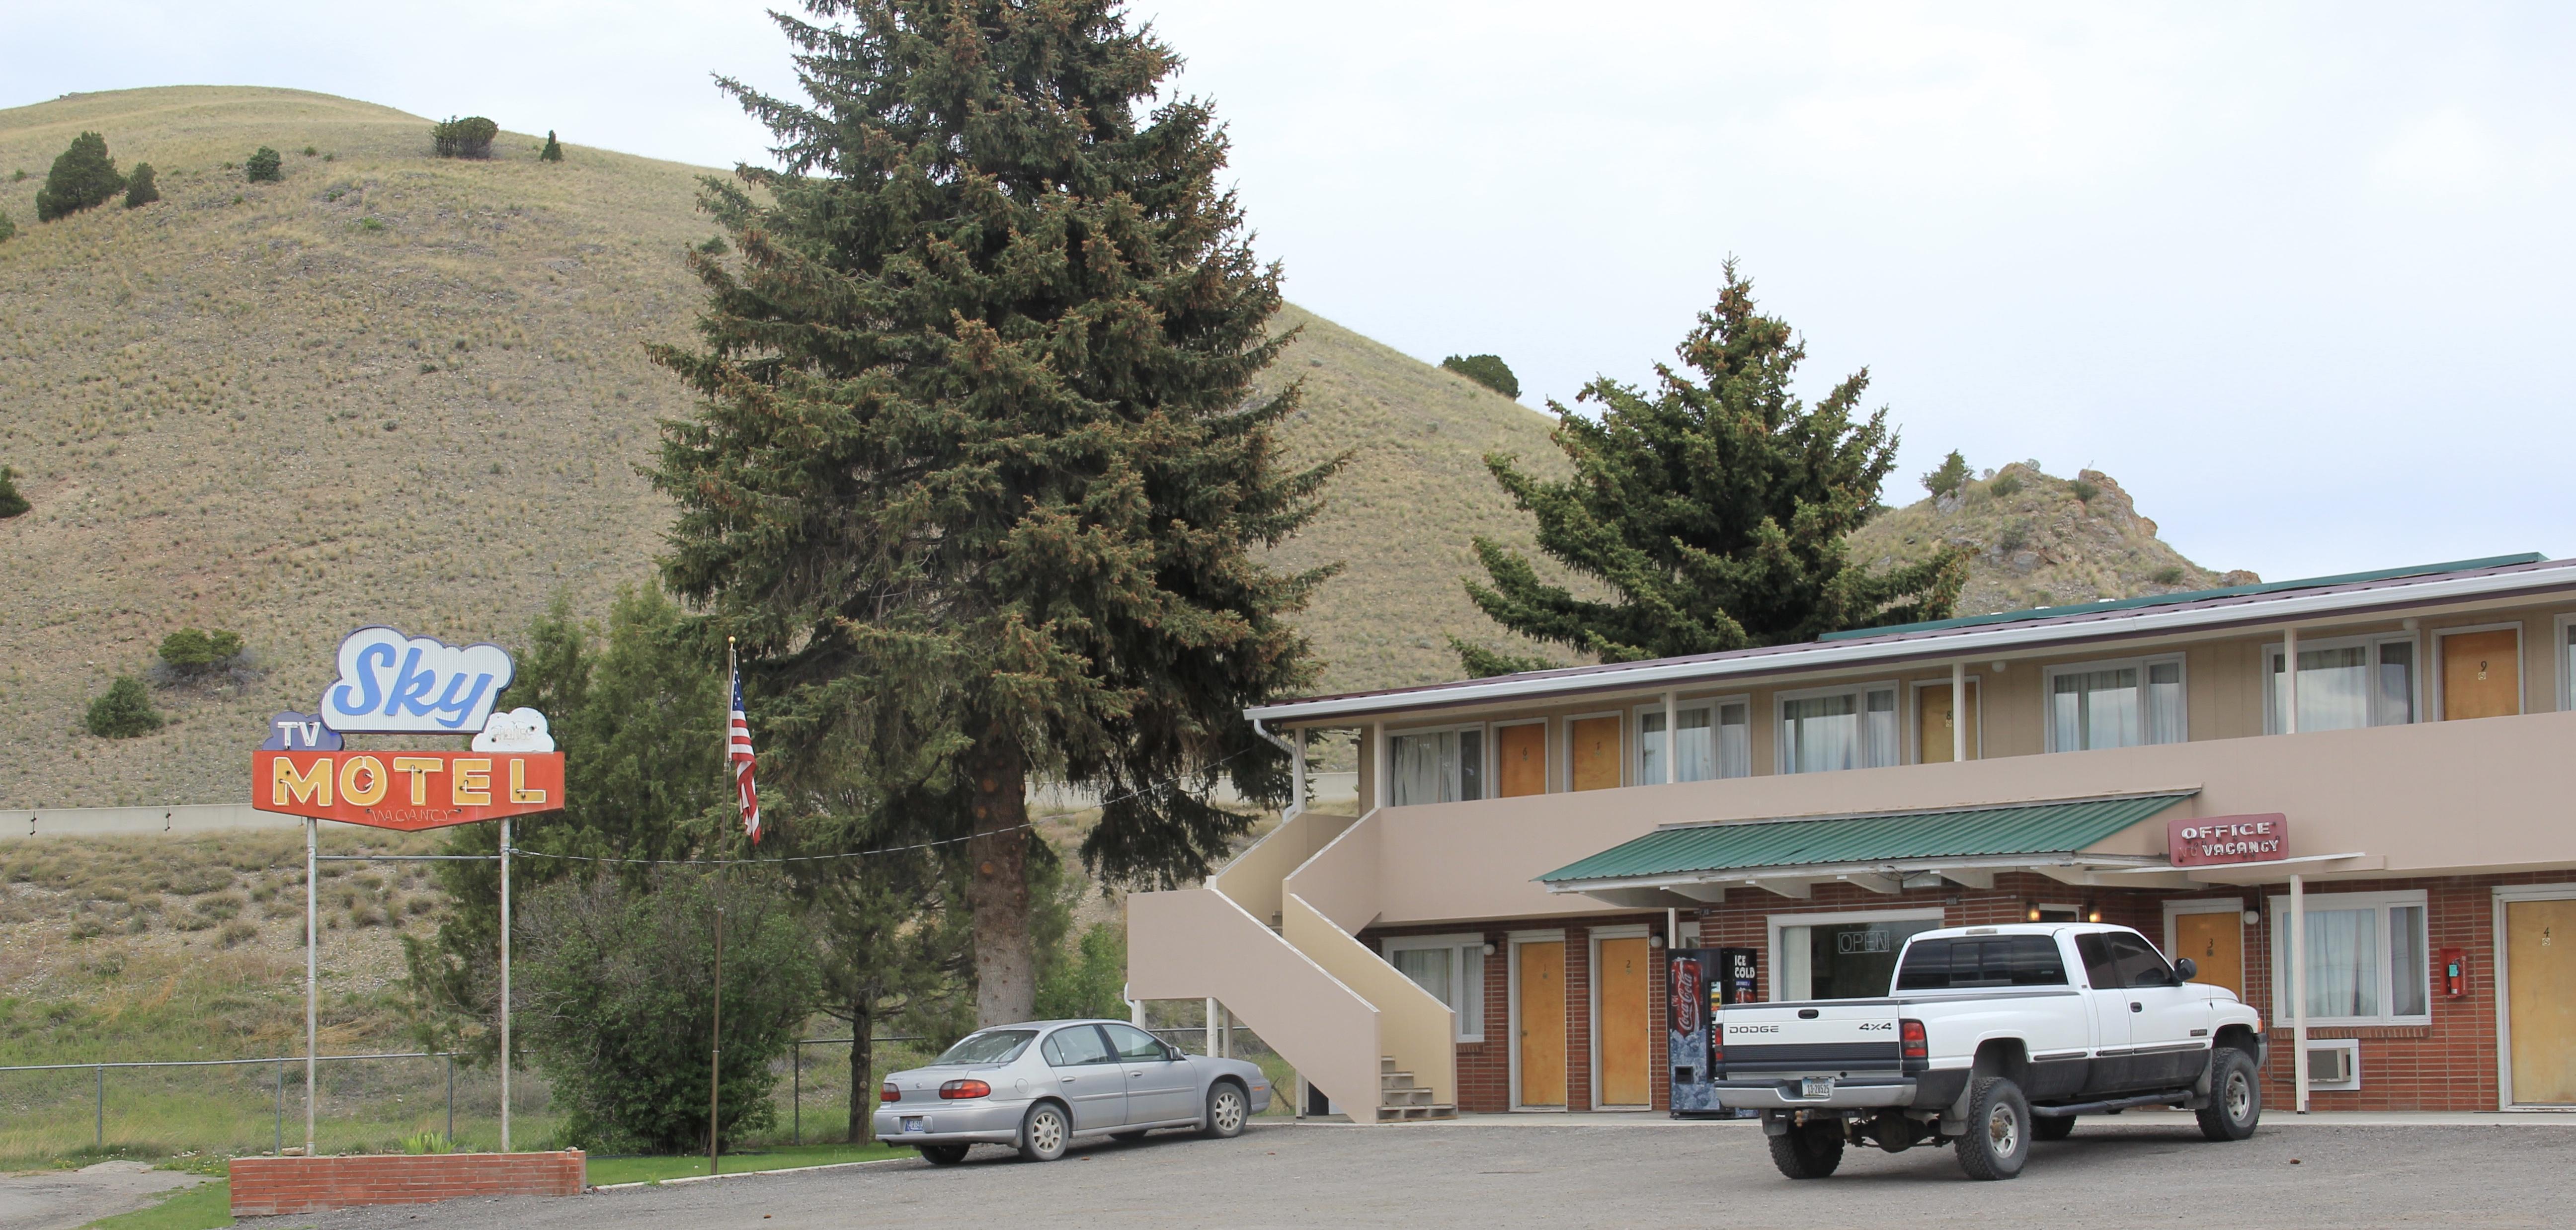 Granite Co, Drummond Sky Motel off Front St roadside